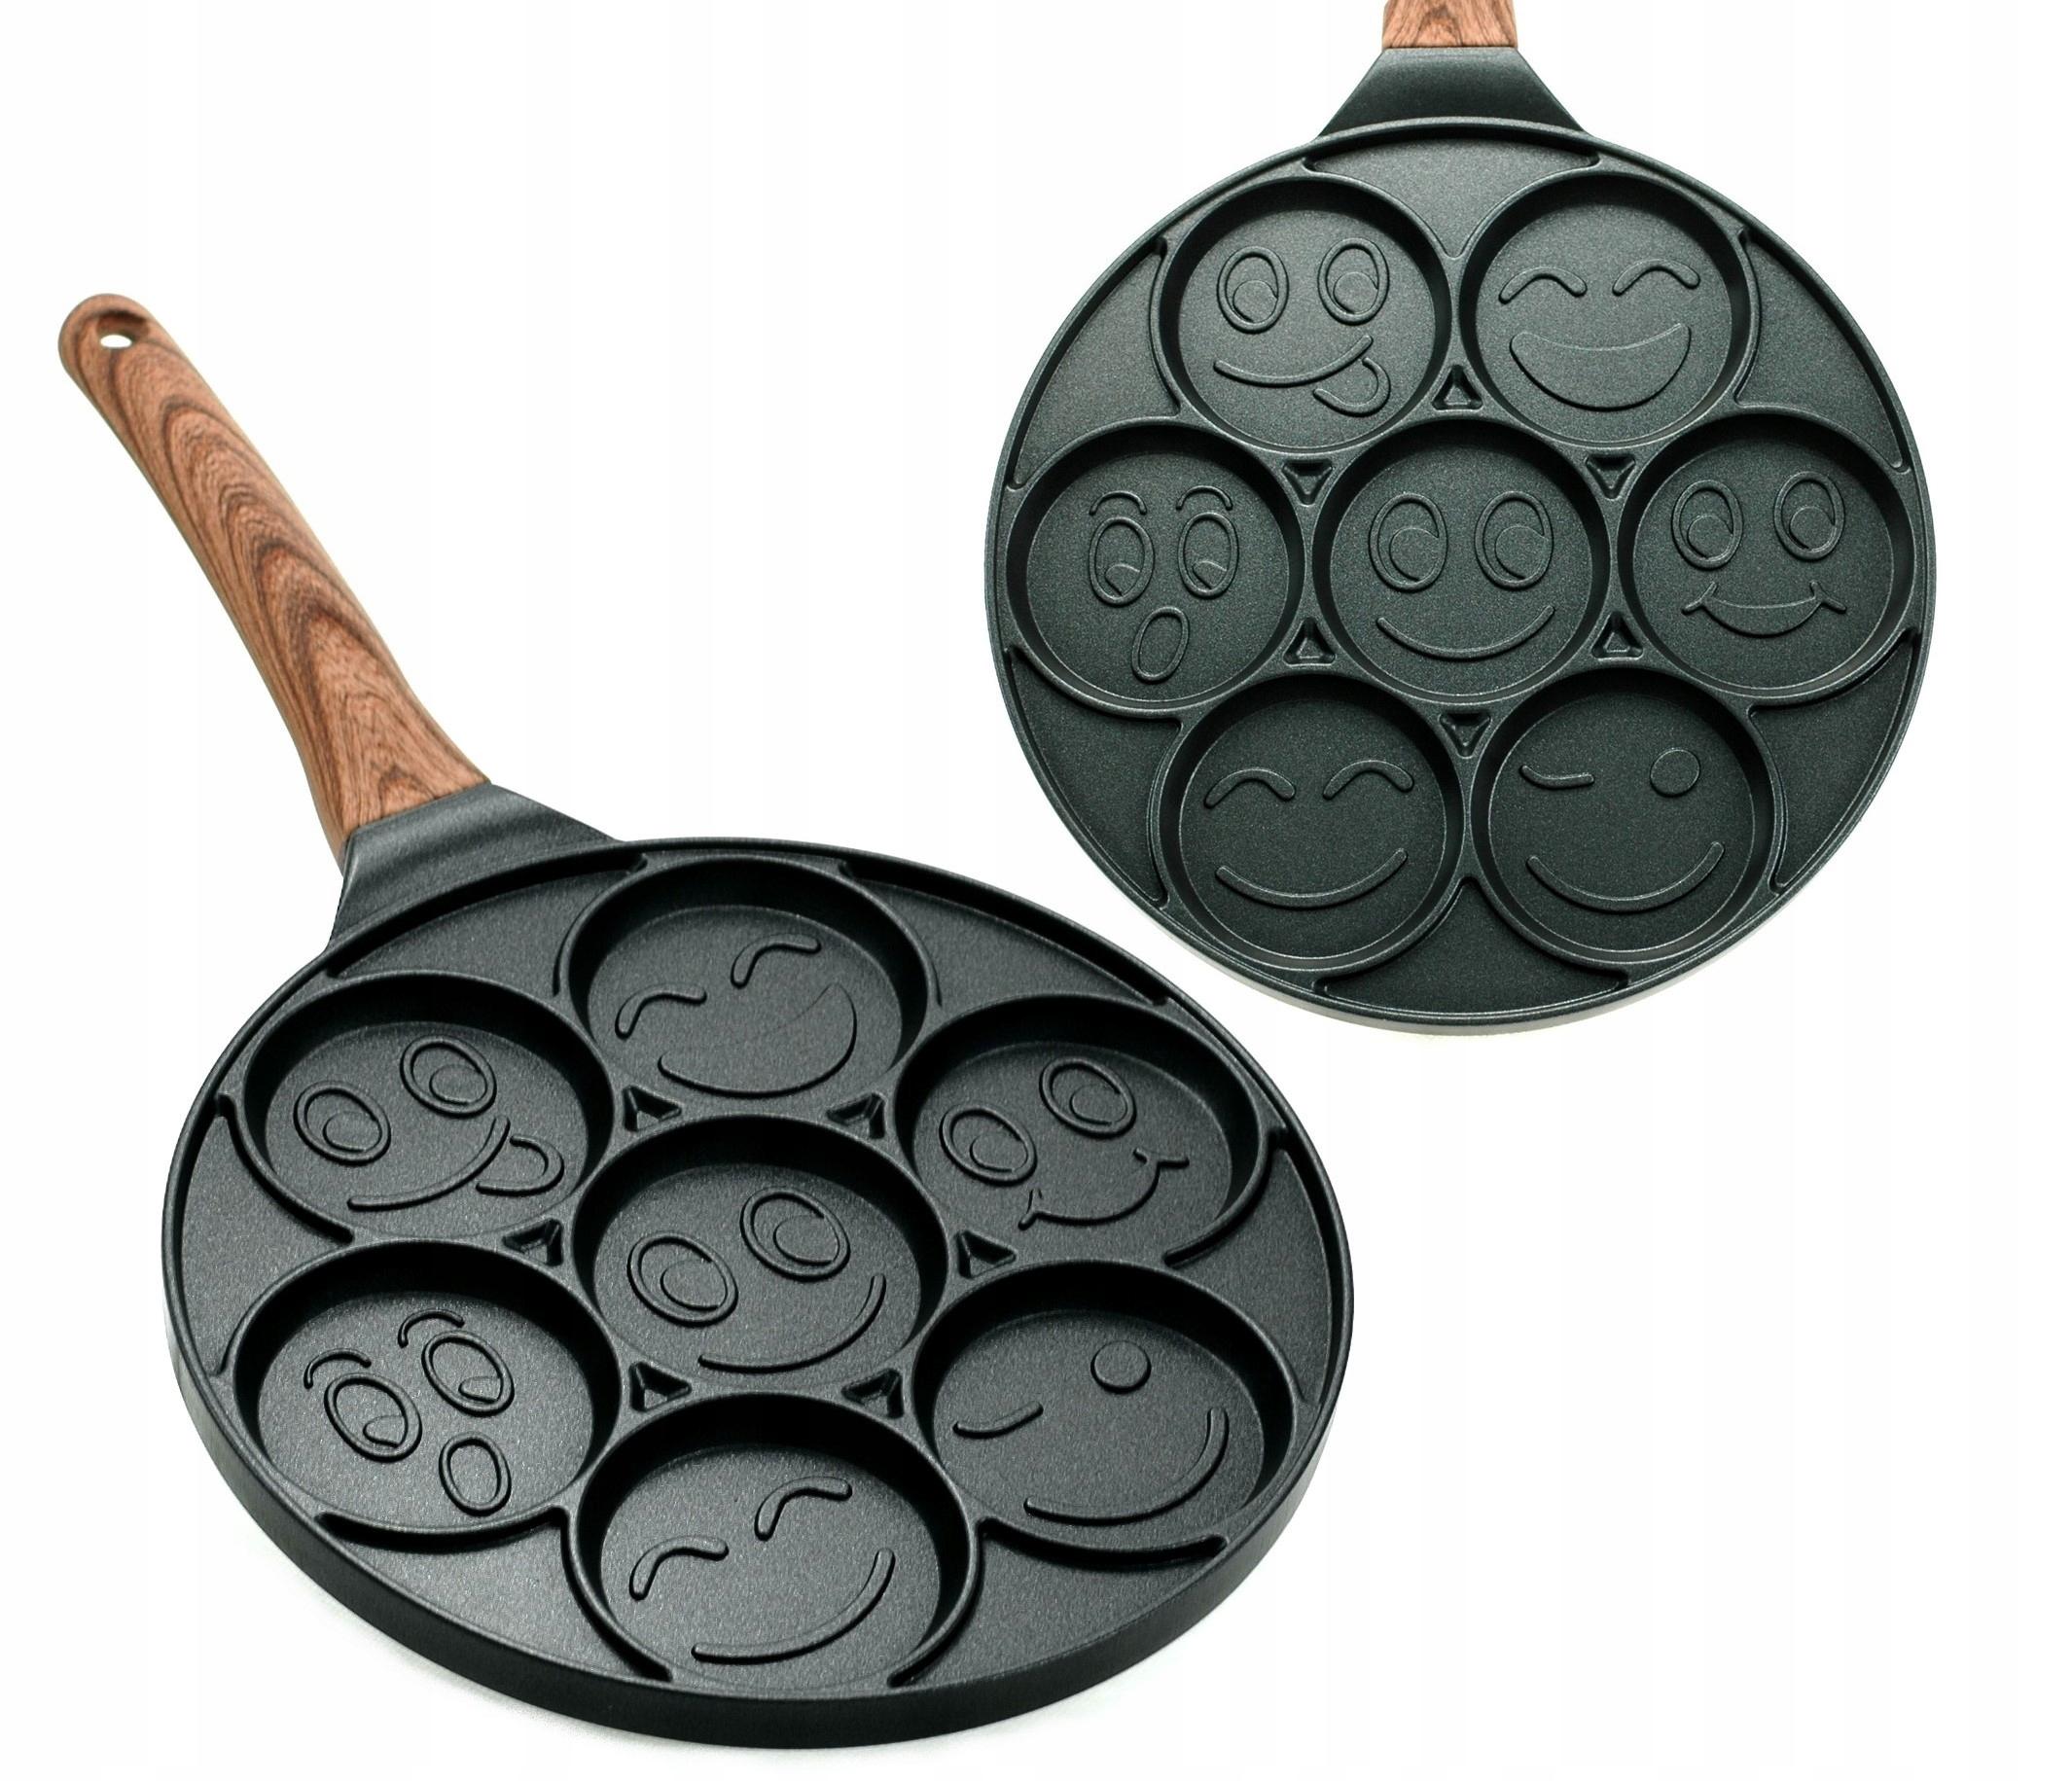 PATELNIA JAJEK RACUCHÓW Pancakes Placków Buźki 783